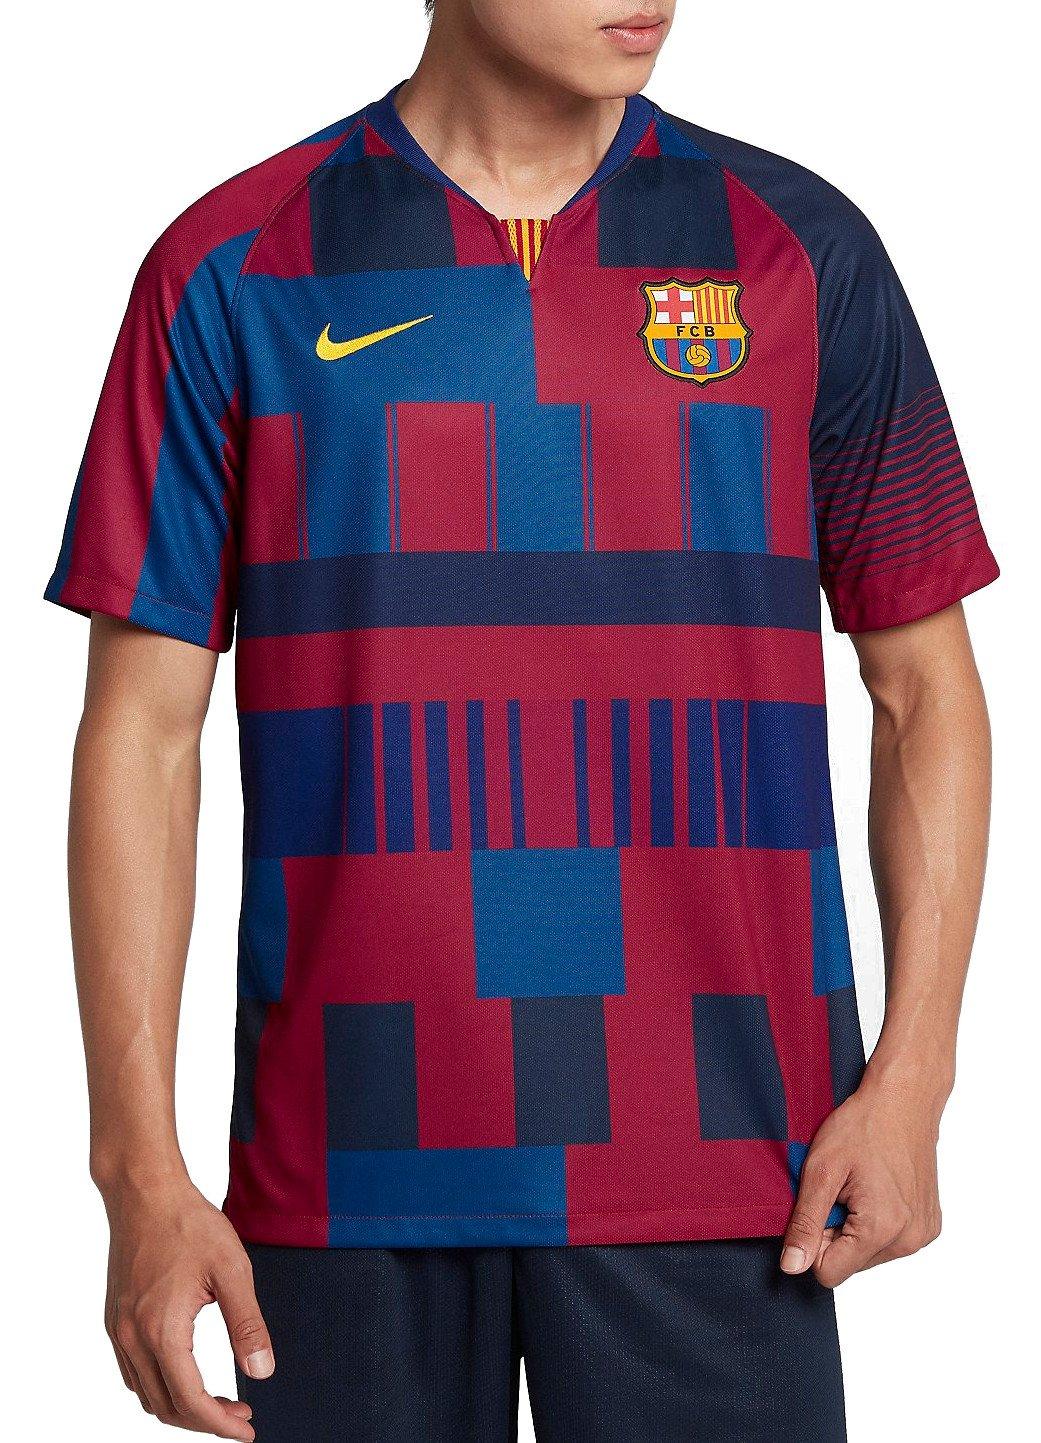 Replika pánského fotbalového dresu Nike FC Barcelona 2018/19